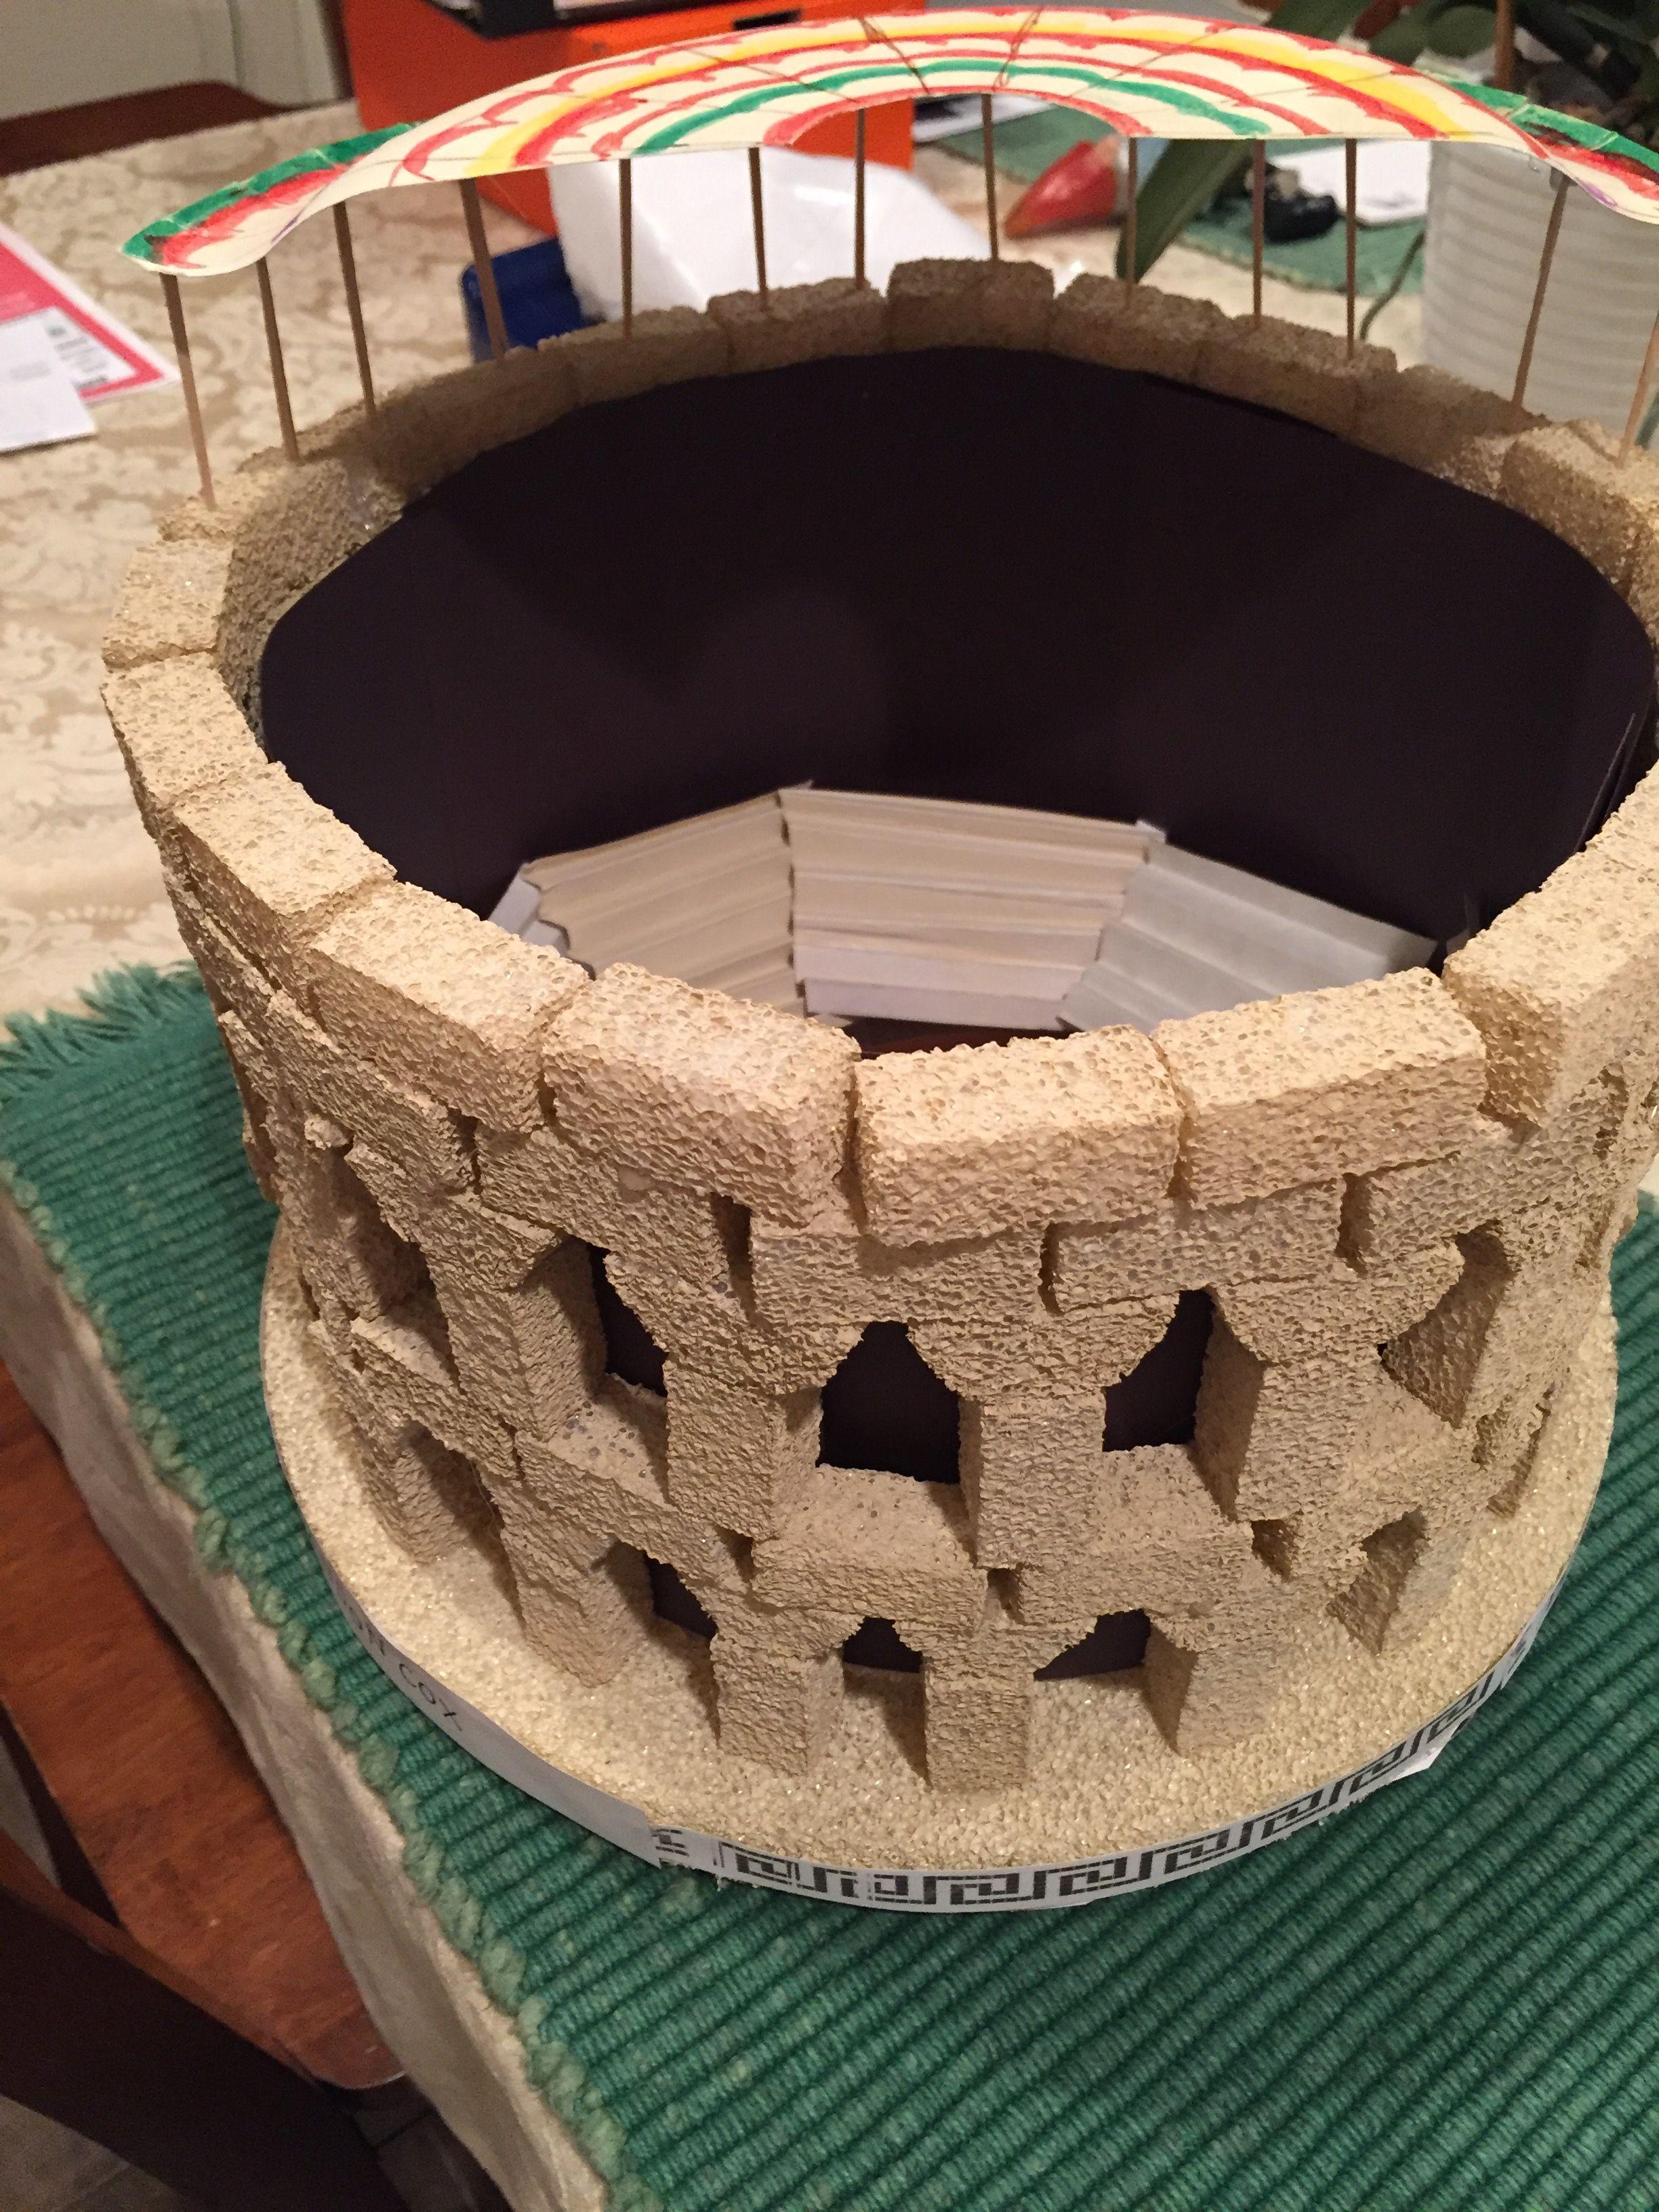 Roman Colosseum 6th Grade Foam Base Styrofoam Project